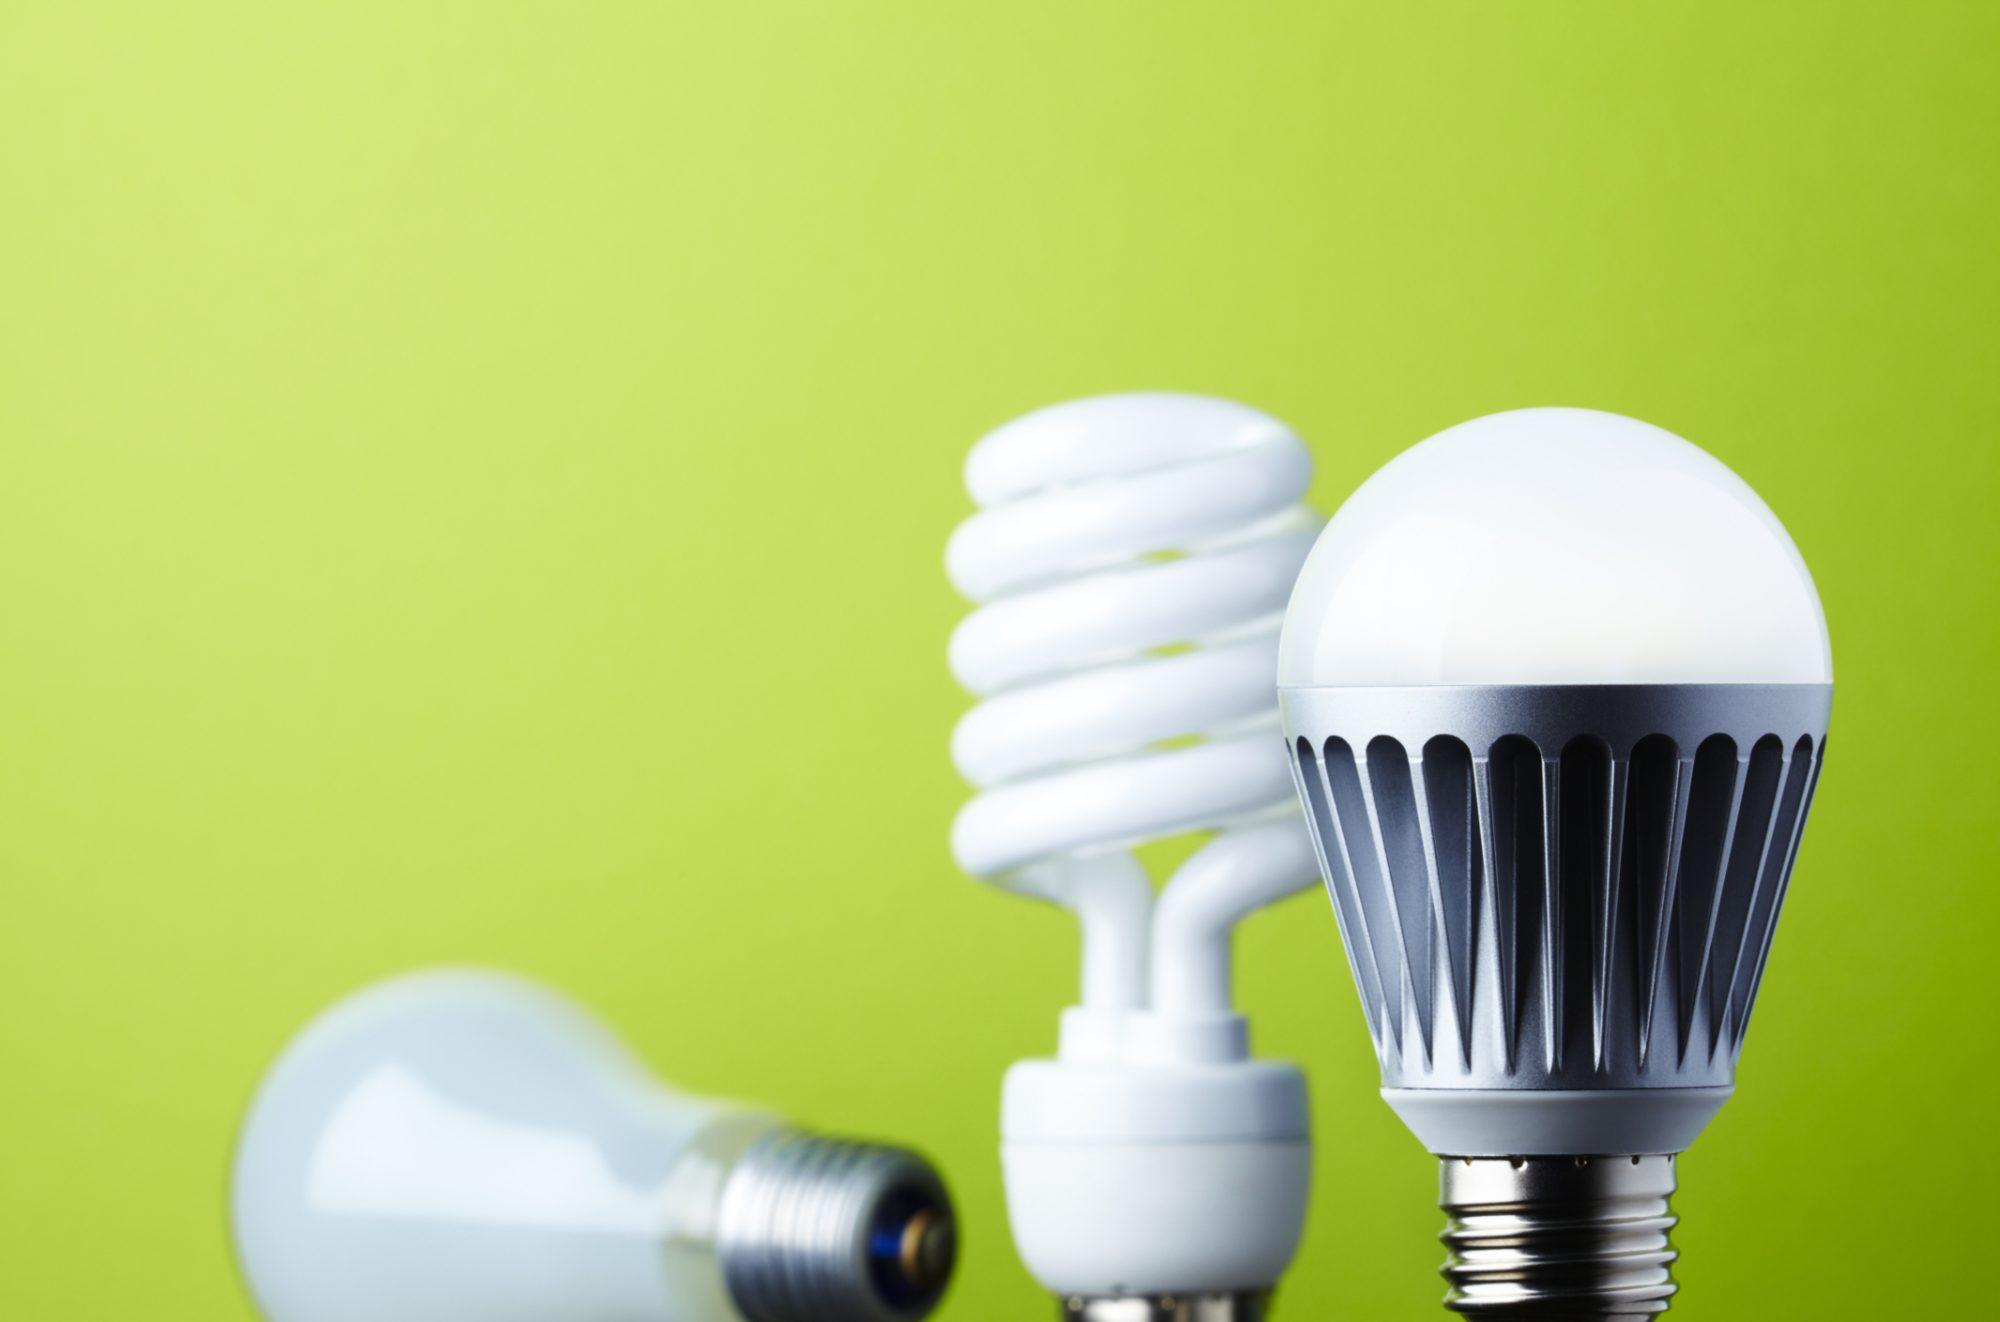 Light Bulb 1 Stock Photo Imagesthai Light Bulb Lightbulbs Close Up Glowing Light Bulb 28